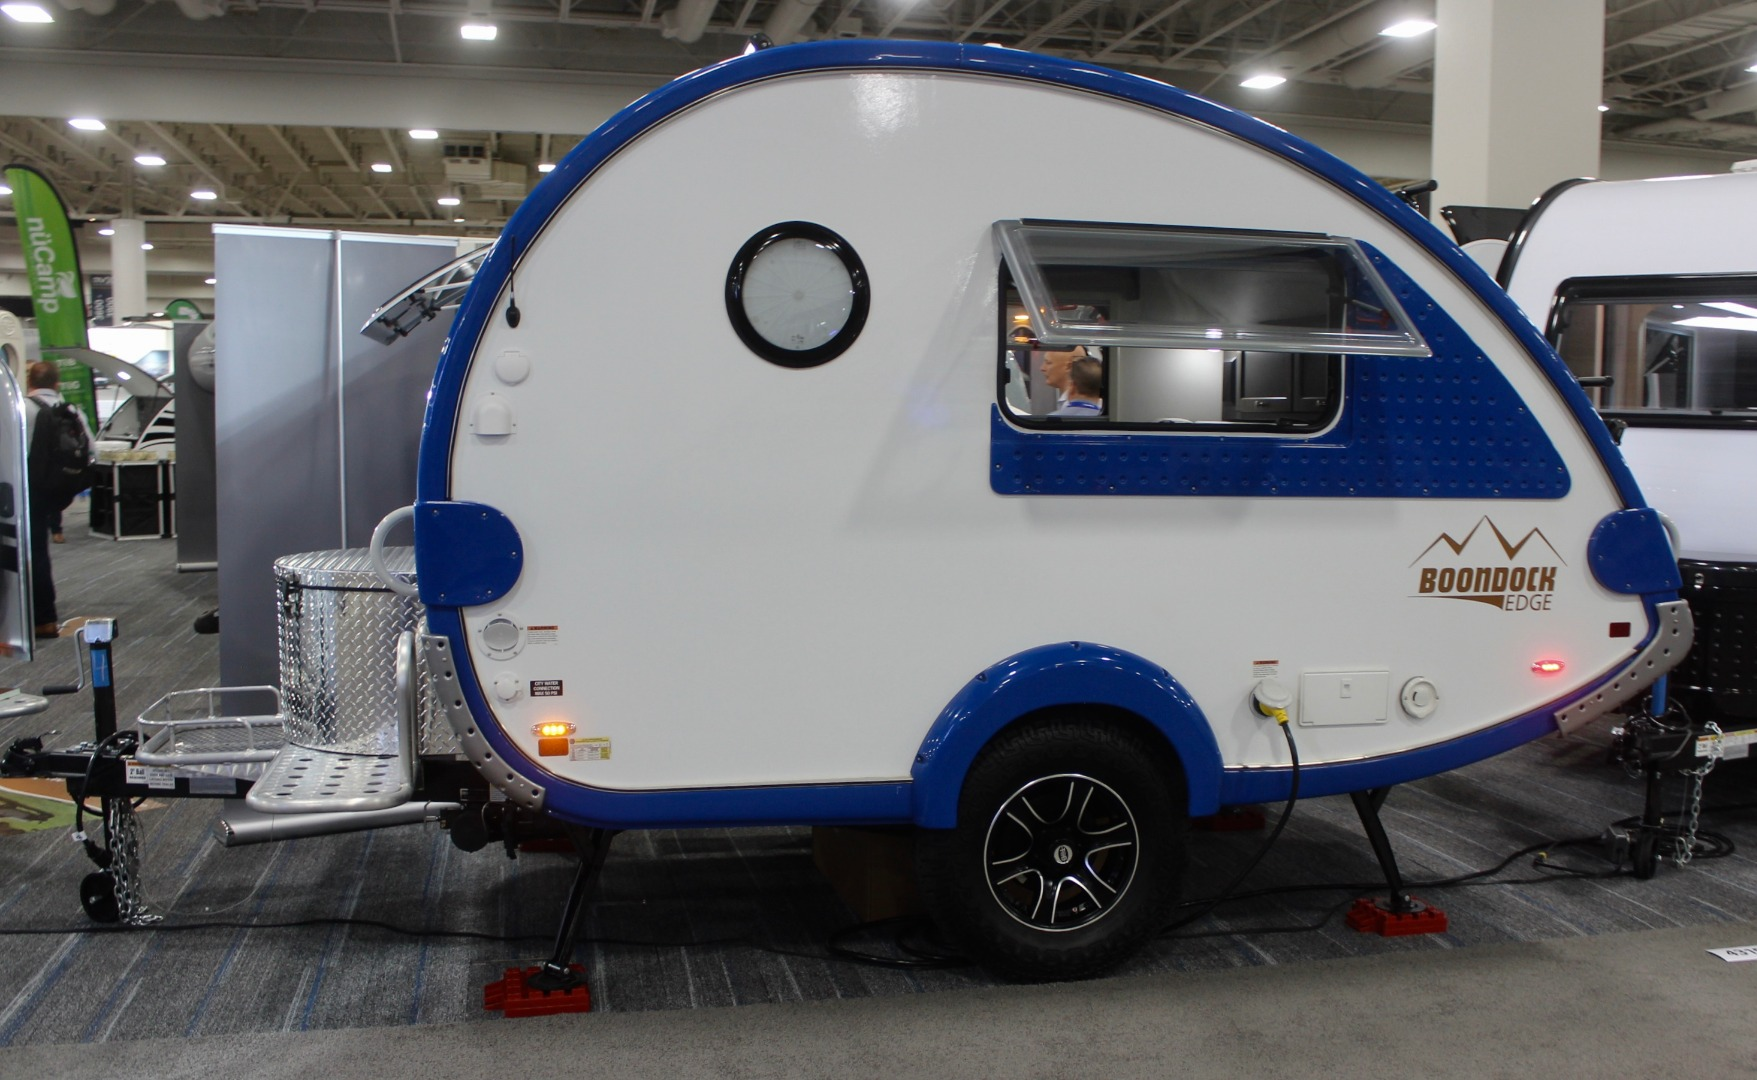 https://newatlas com/koa-campgrounds-of-the-future/58928